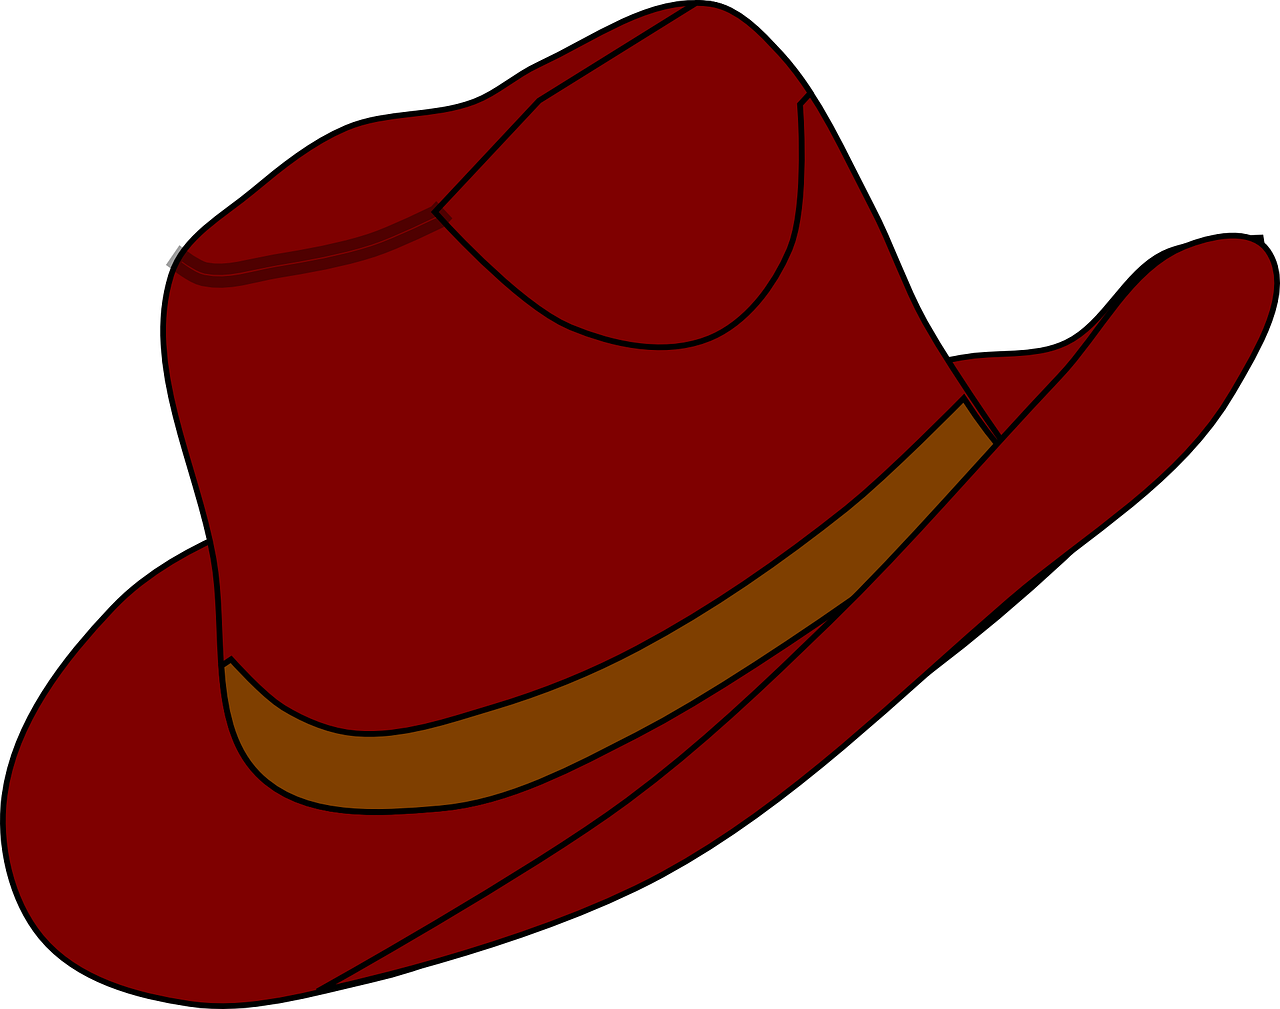 Cowboy hat clipart free danaspaj top-Cowboy hat clipart free danaspaj top-9